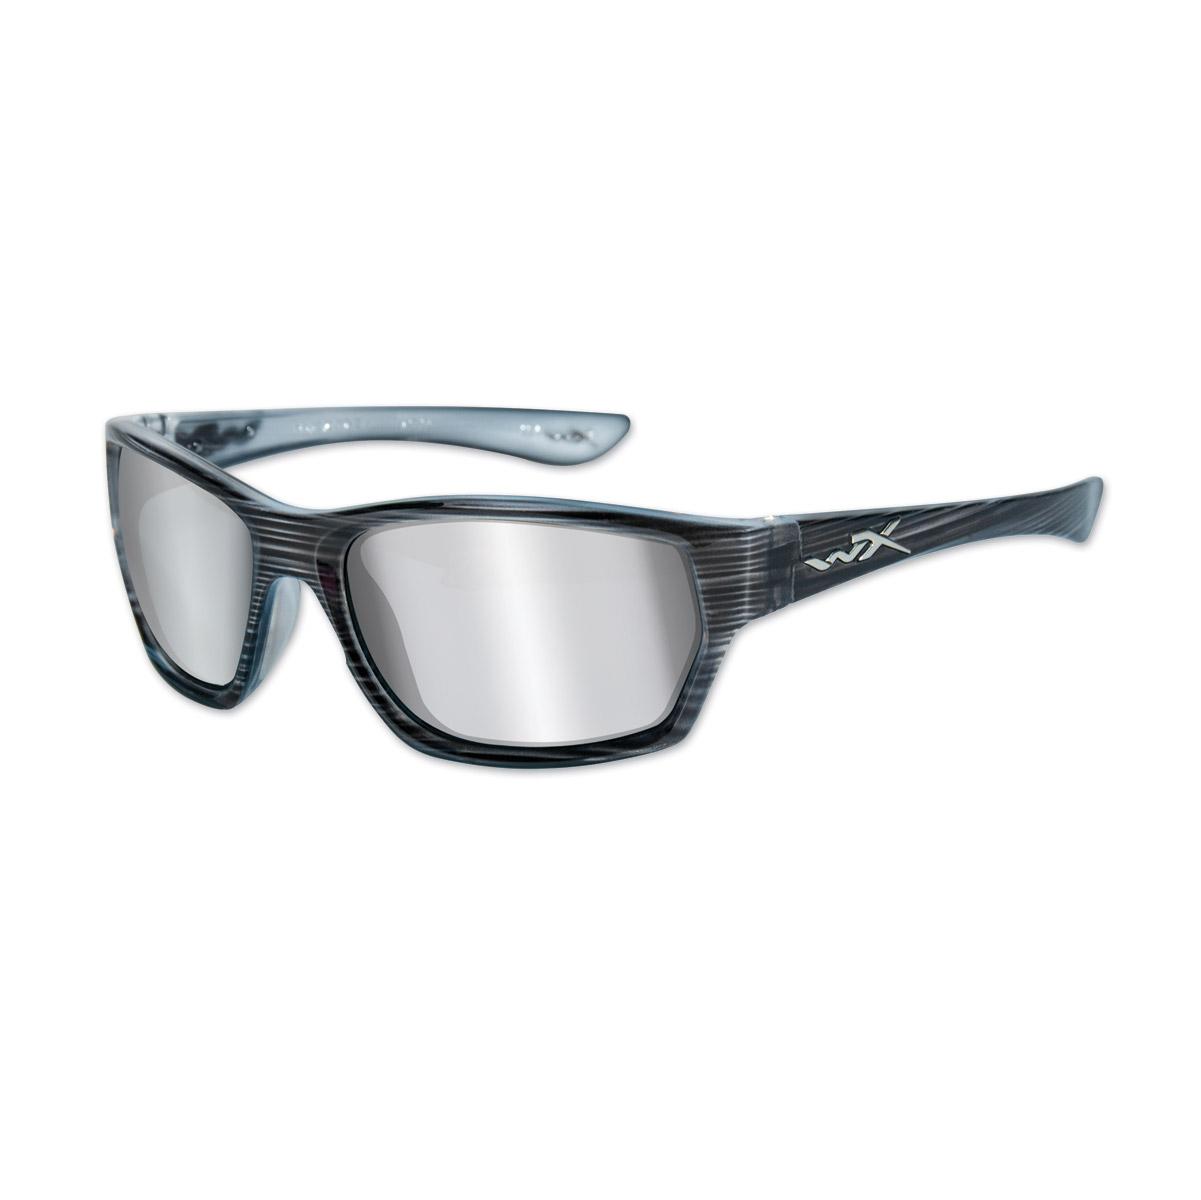 Wiley X WX Moxy Black Streak Frame w/Sliver Flash Mirror Lens Sunglasses